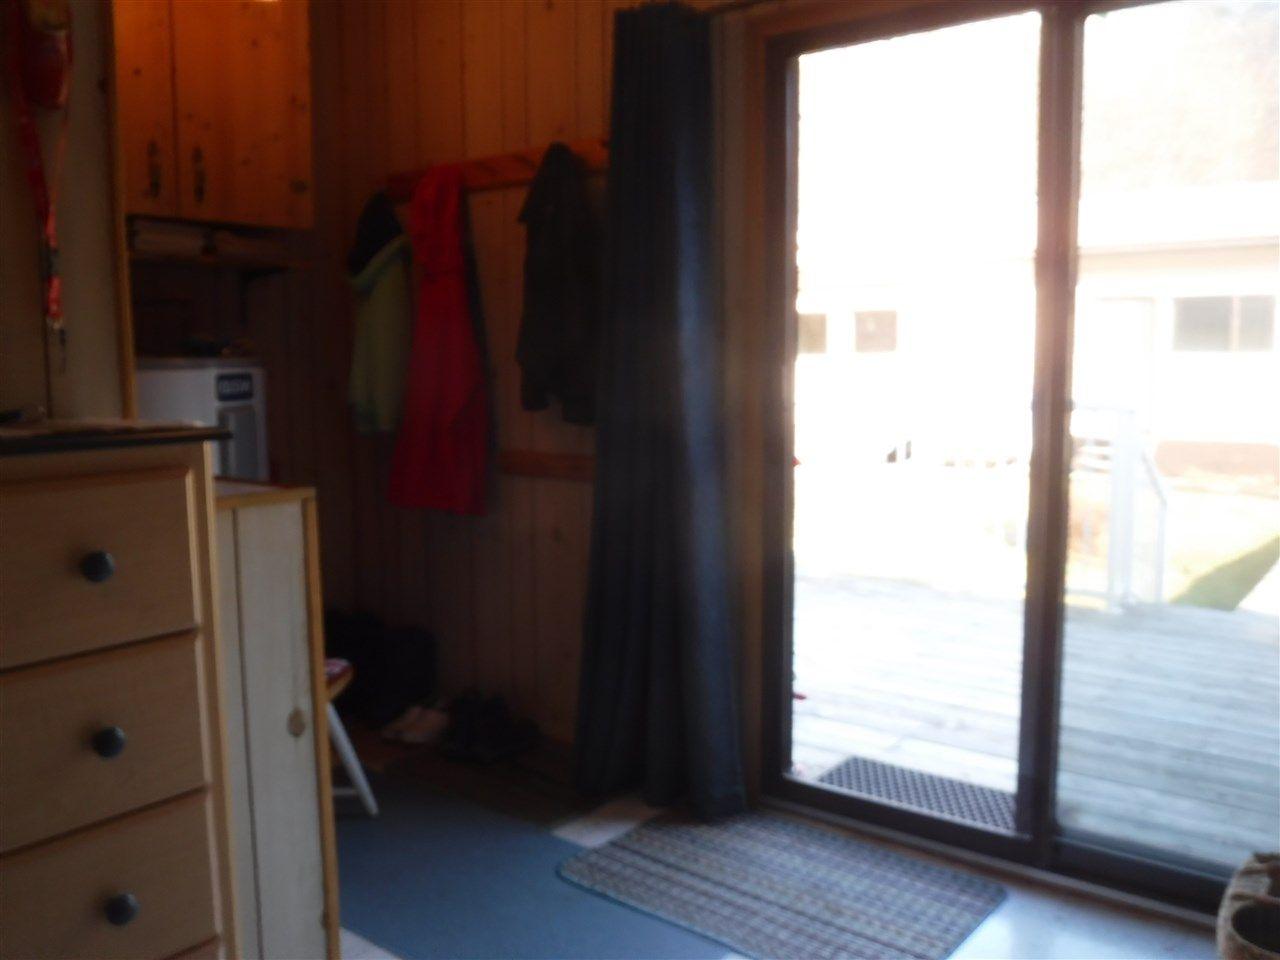 Photo 6: Photos: 1599 MACKENZIE Highway in Bella Coola: Bella Coola/Hagensborg House for sale (Williams Lake (Zone 27))  : MLS®# R2449026